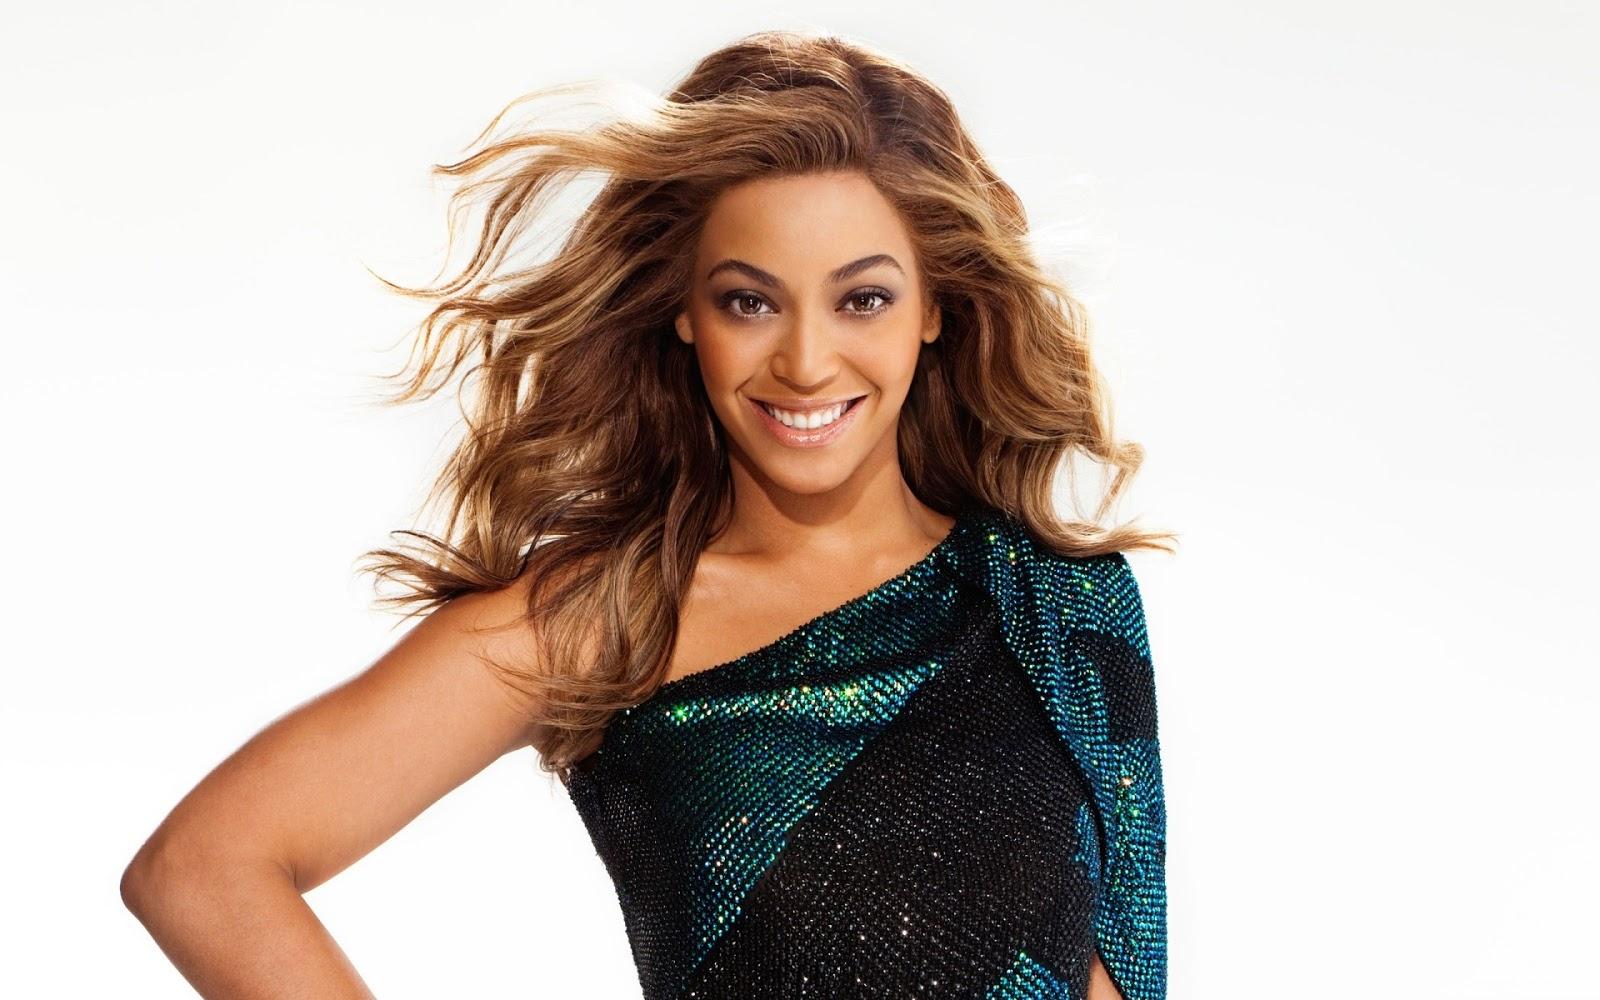 Beyonce Beautiful Smile